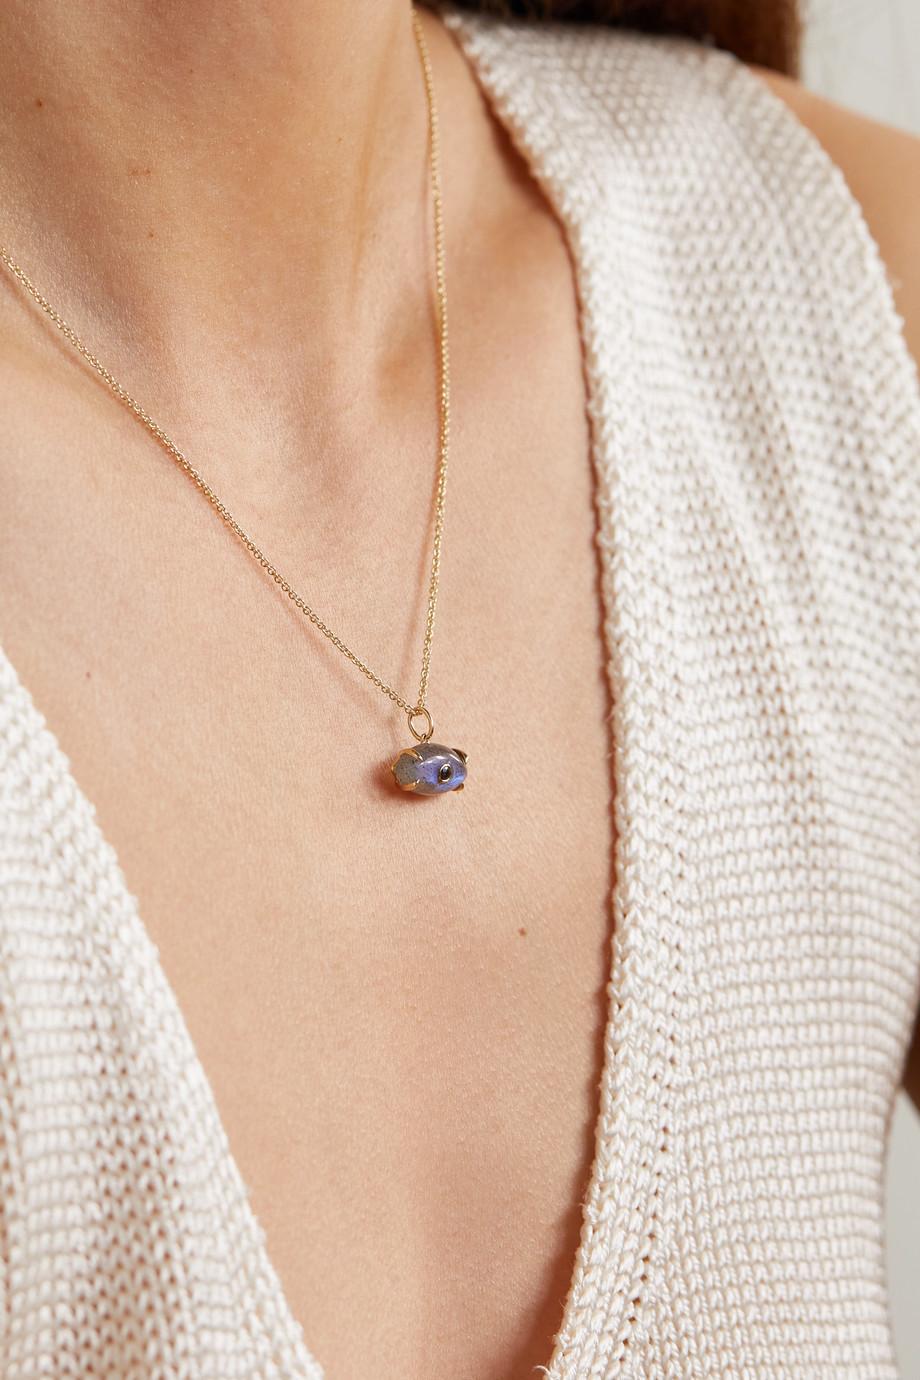 Sydney Evan 14-karat gold, labradorite and sapphire necklace